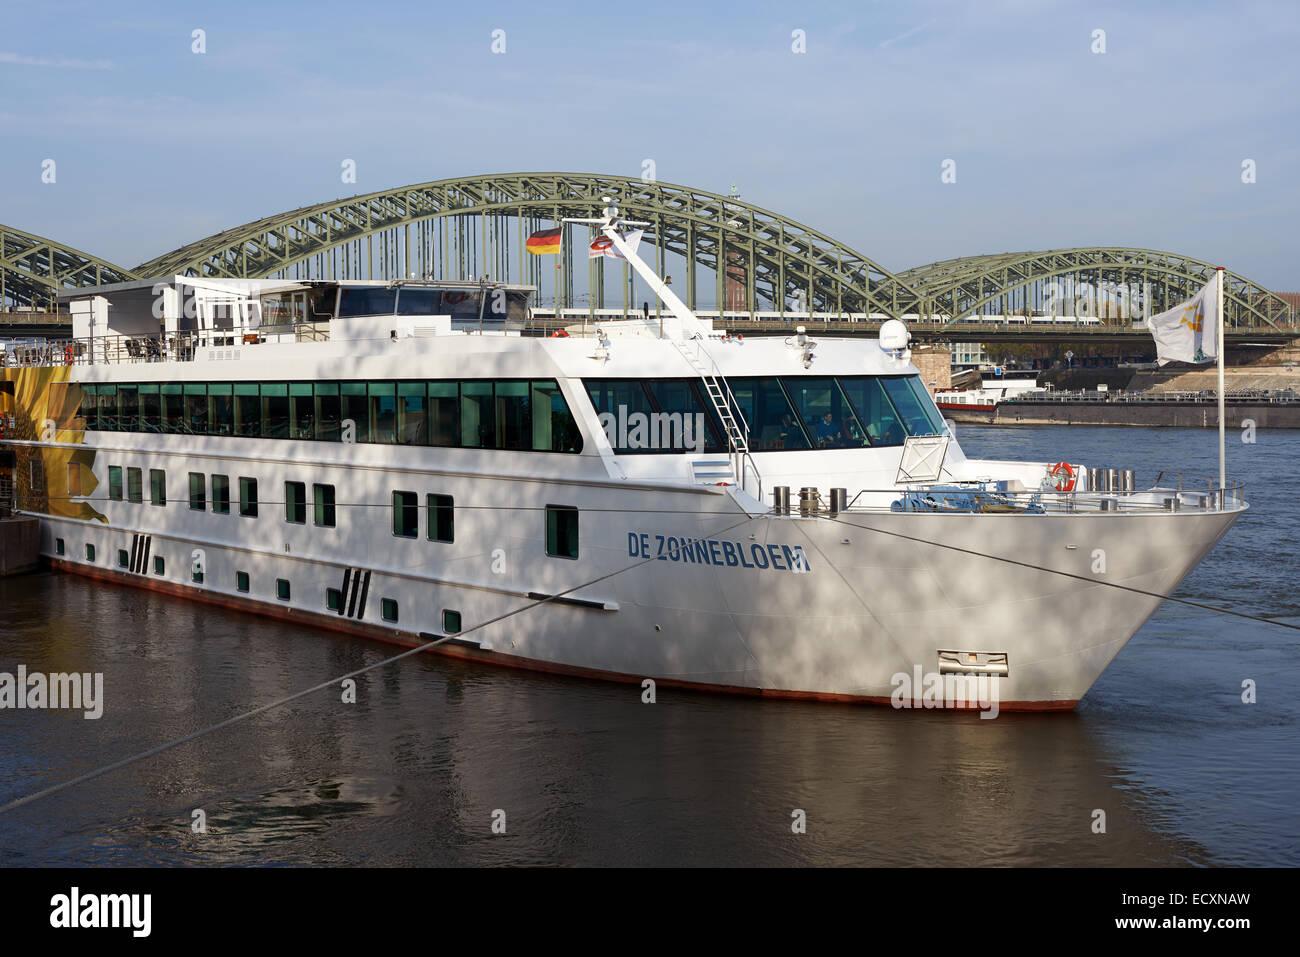 Viking Cruisers De Zonnebloem Cologne Germany - Stock Image